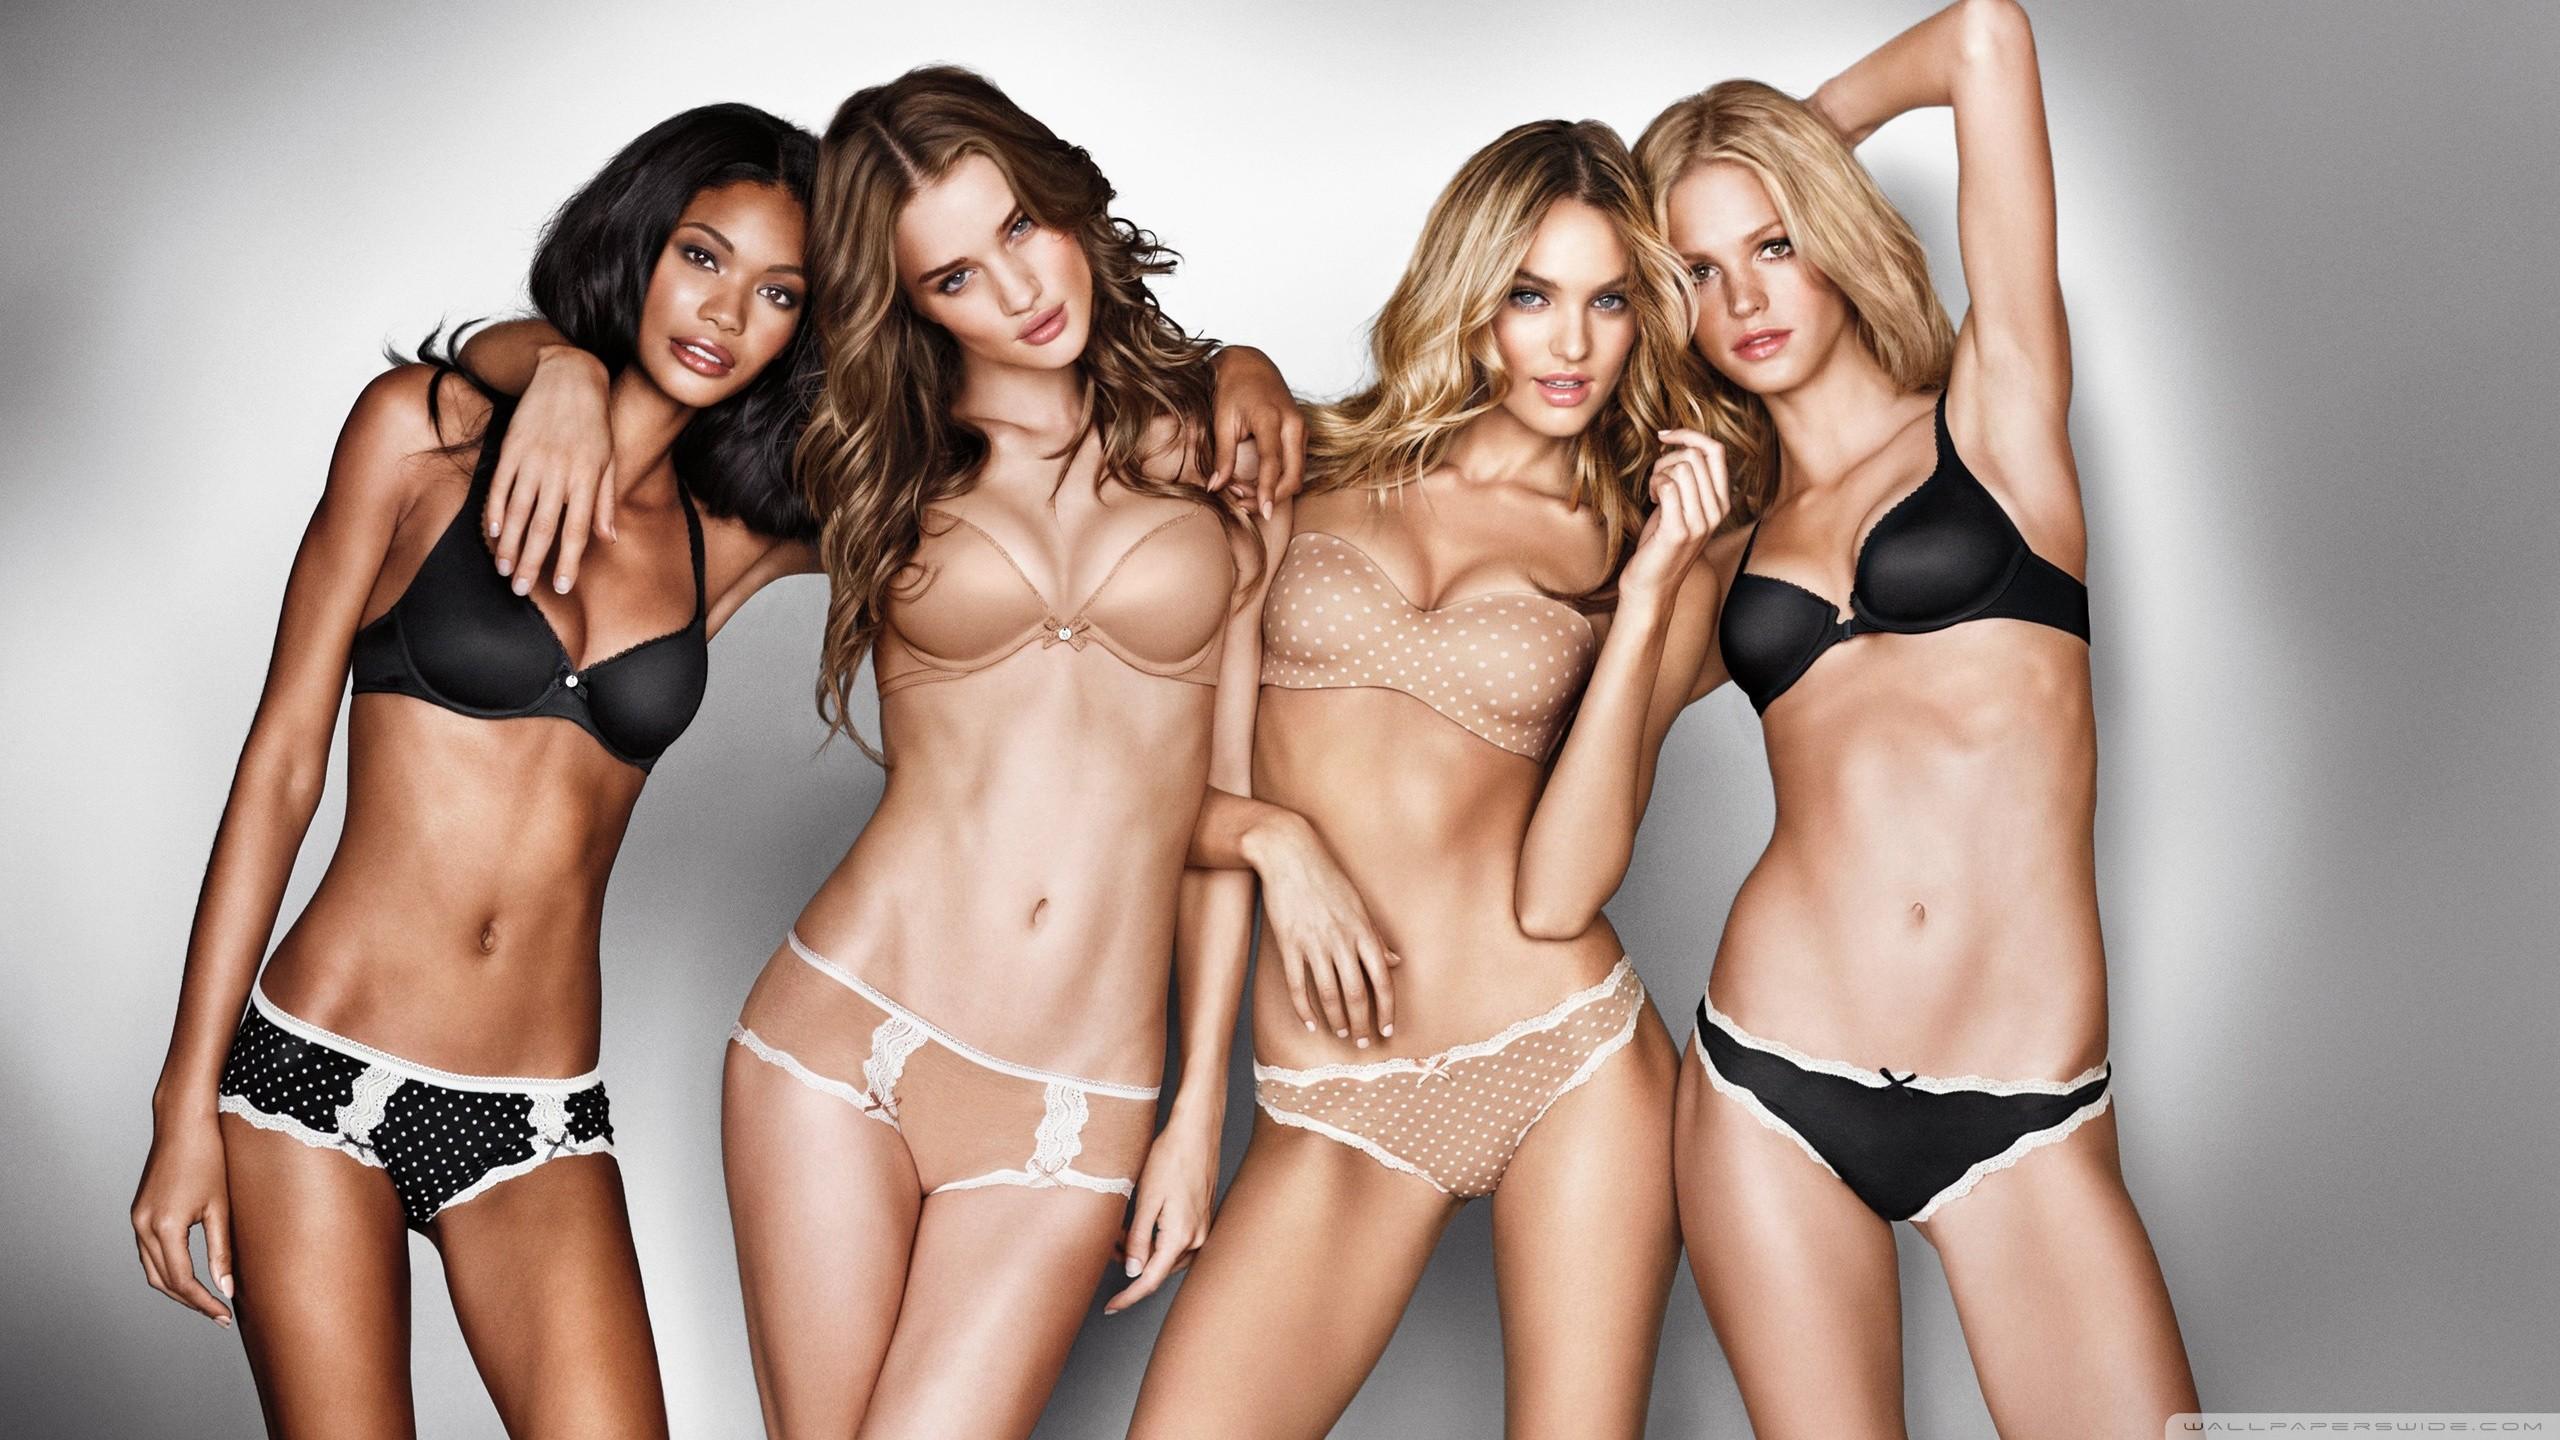 Victoria's Secret Models With Short Bikini